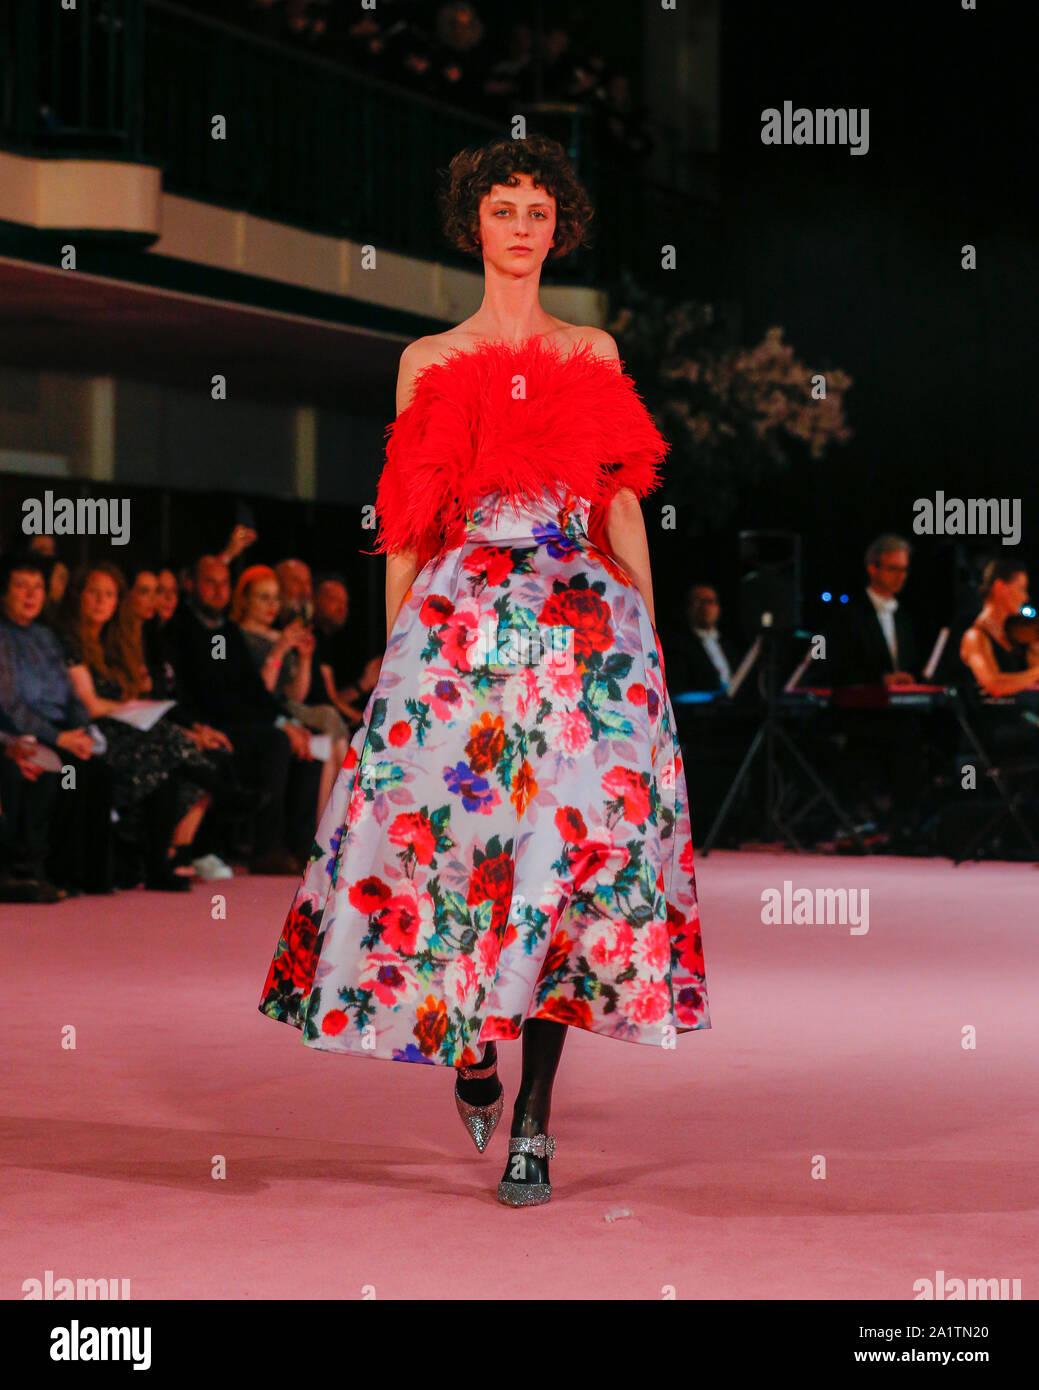 Fashion Catwalk Presentation At London Fashion Week Spring Summer 2019 2020 Presented By Richard Quinn Models At British Fashion Council Show Space Stock Photo Alamy